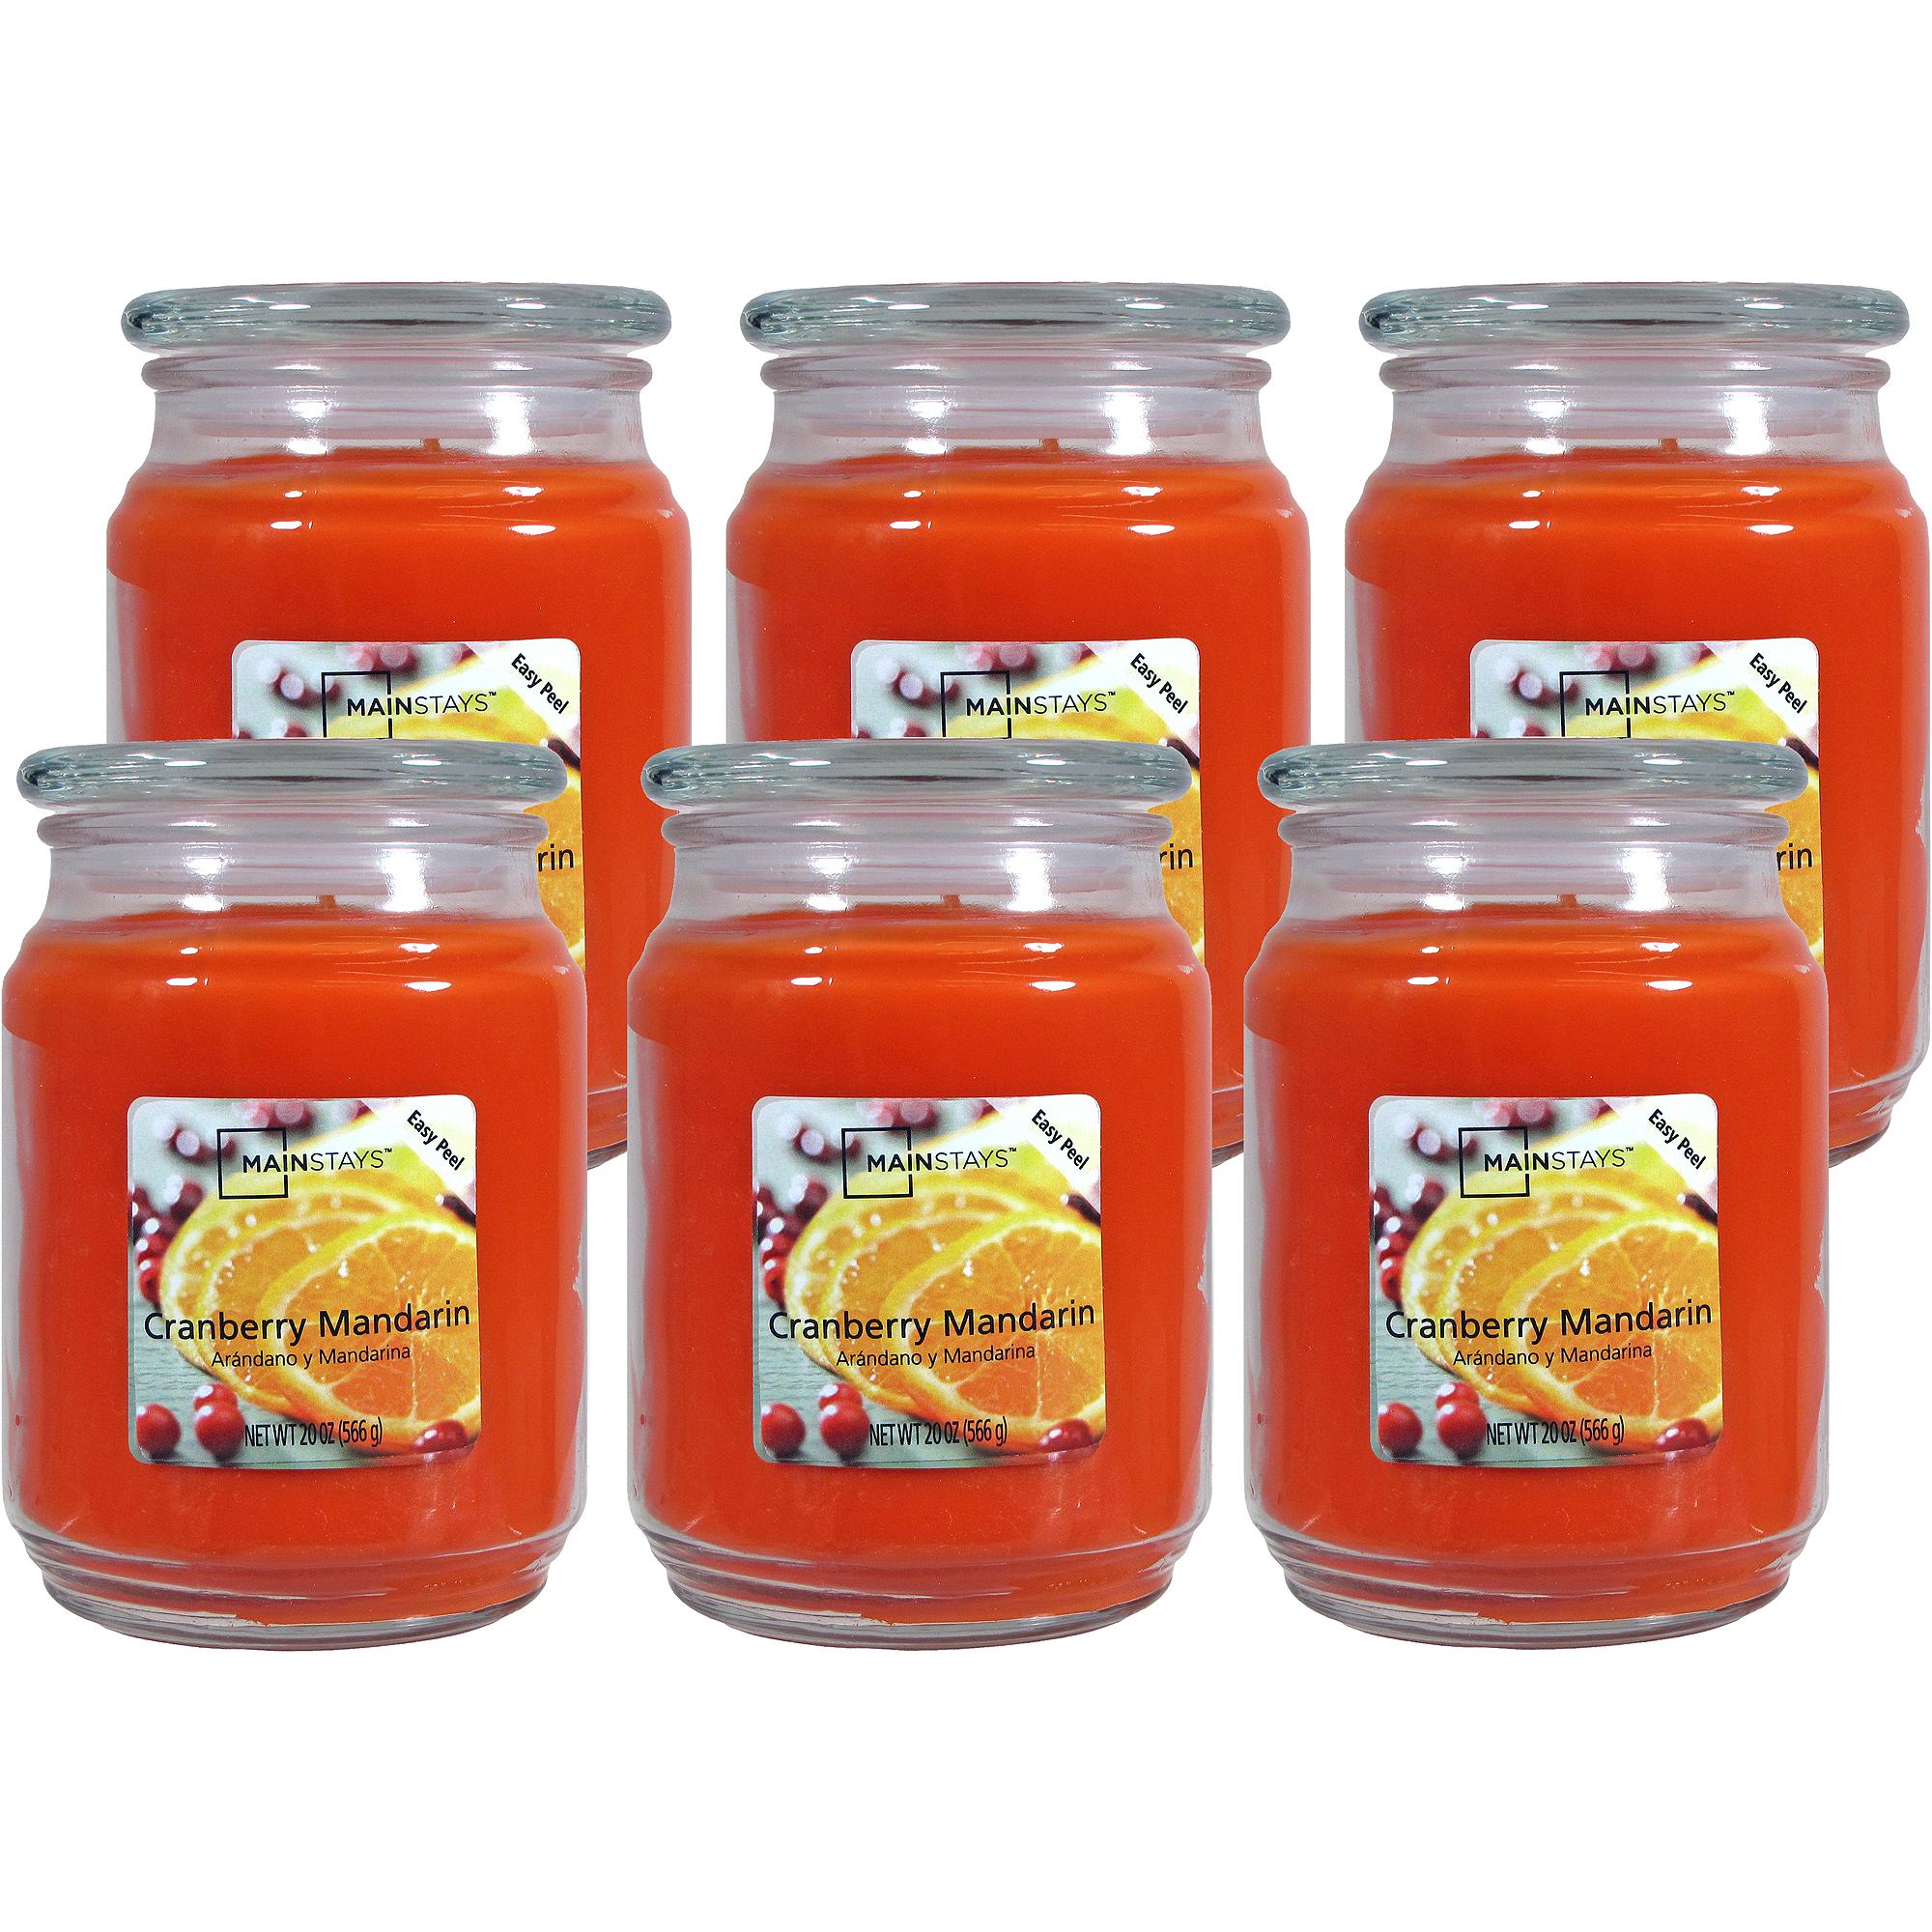 Mainstays 20-oz. Jar Candle, Cranberry Mandarin, Set of 6